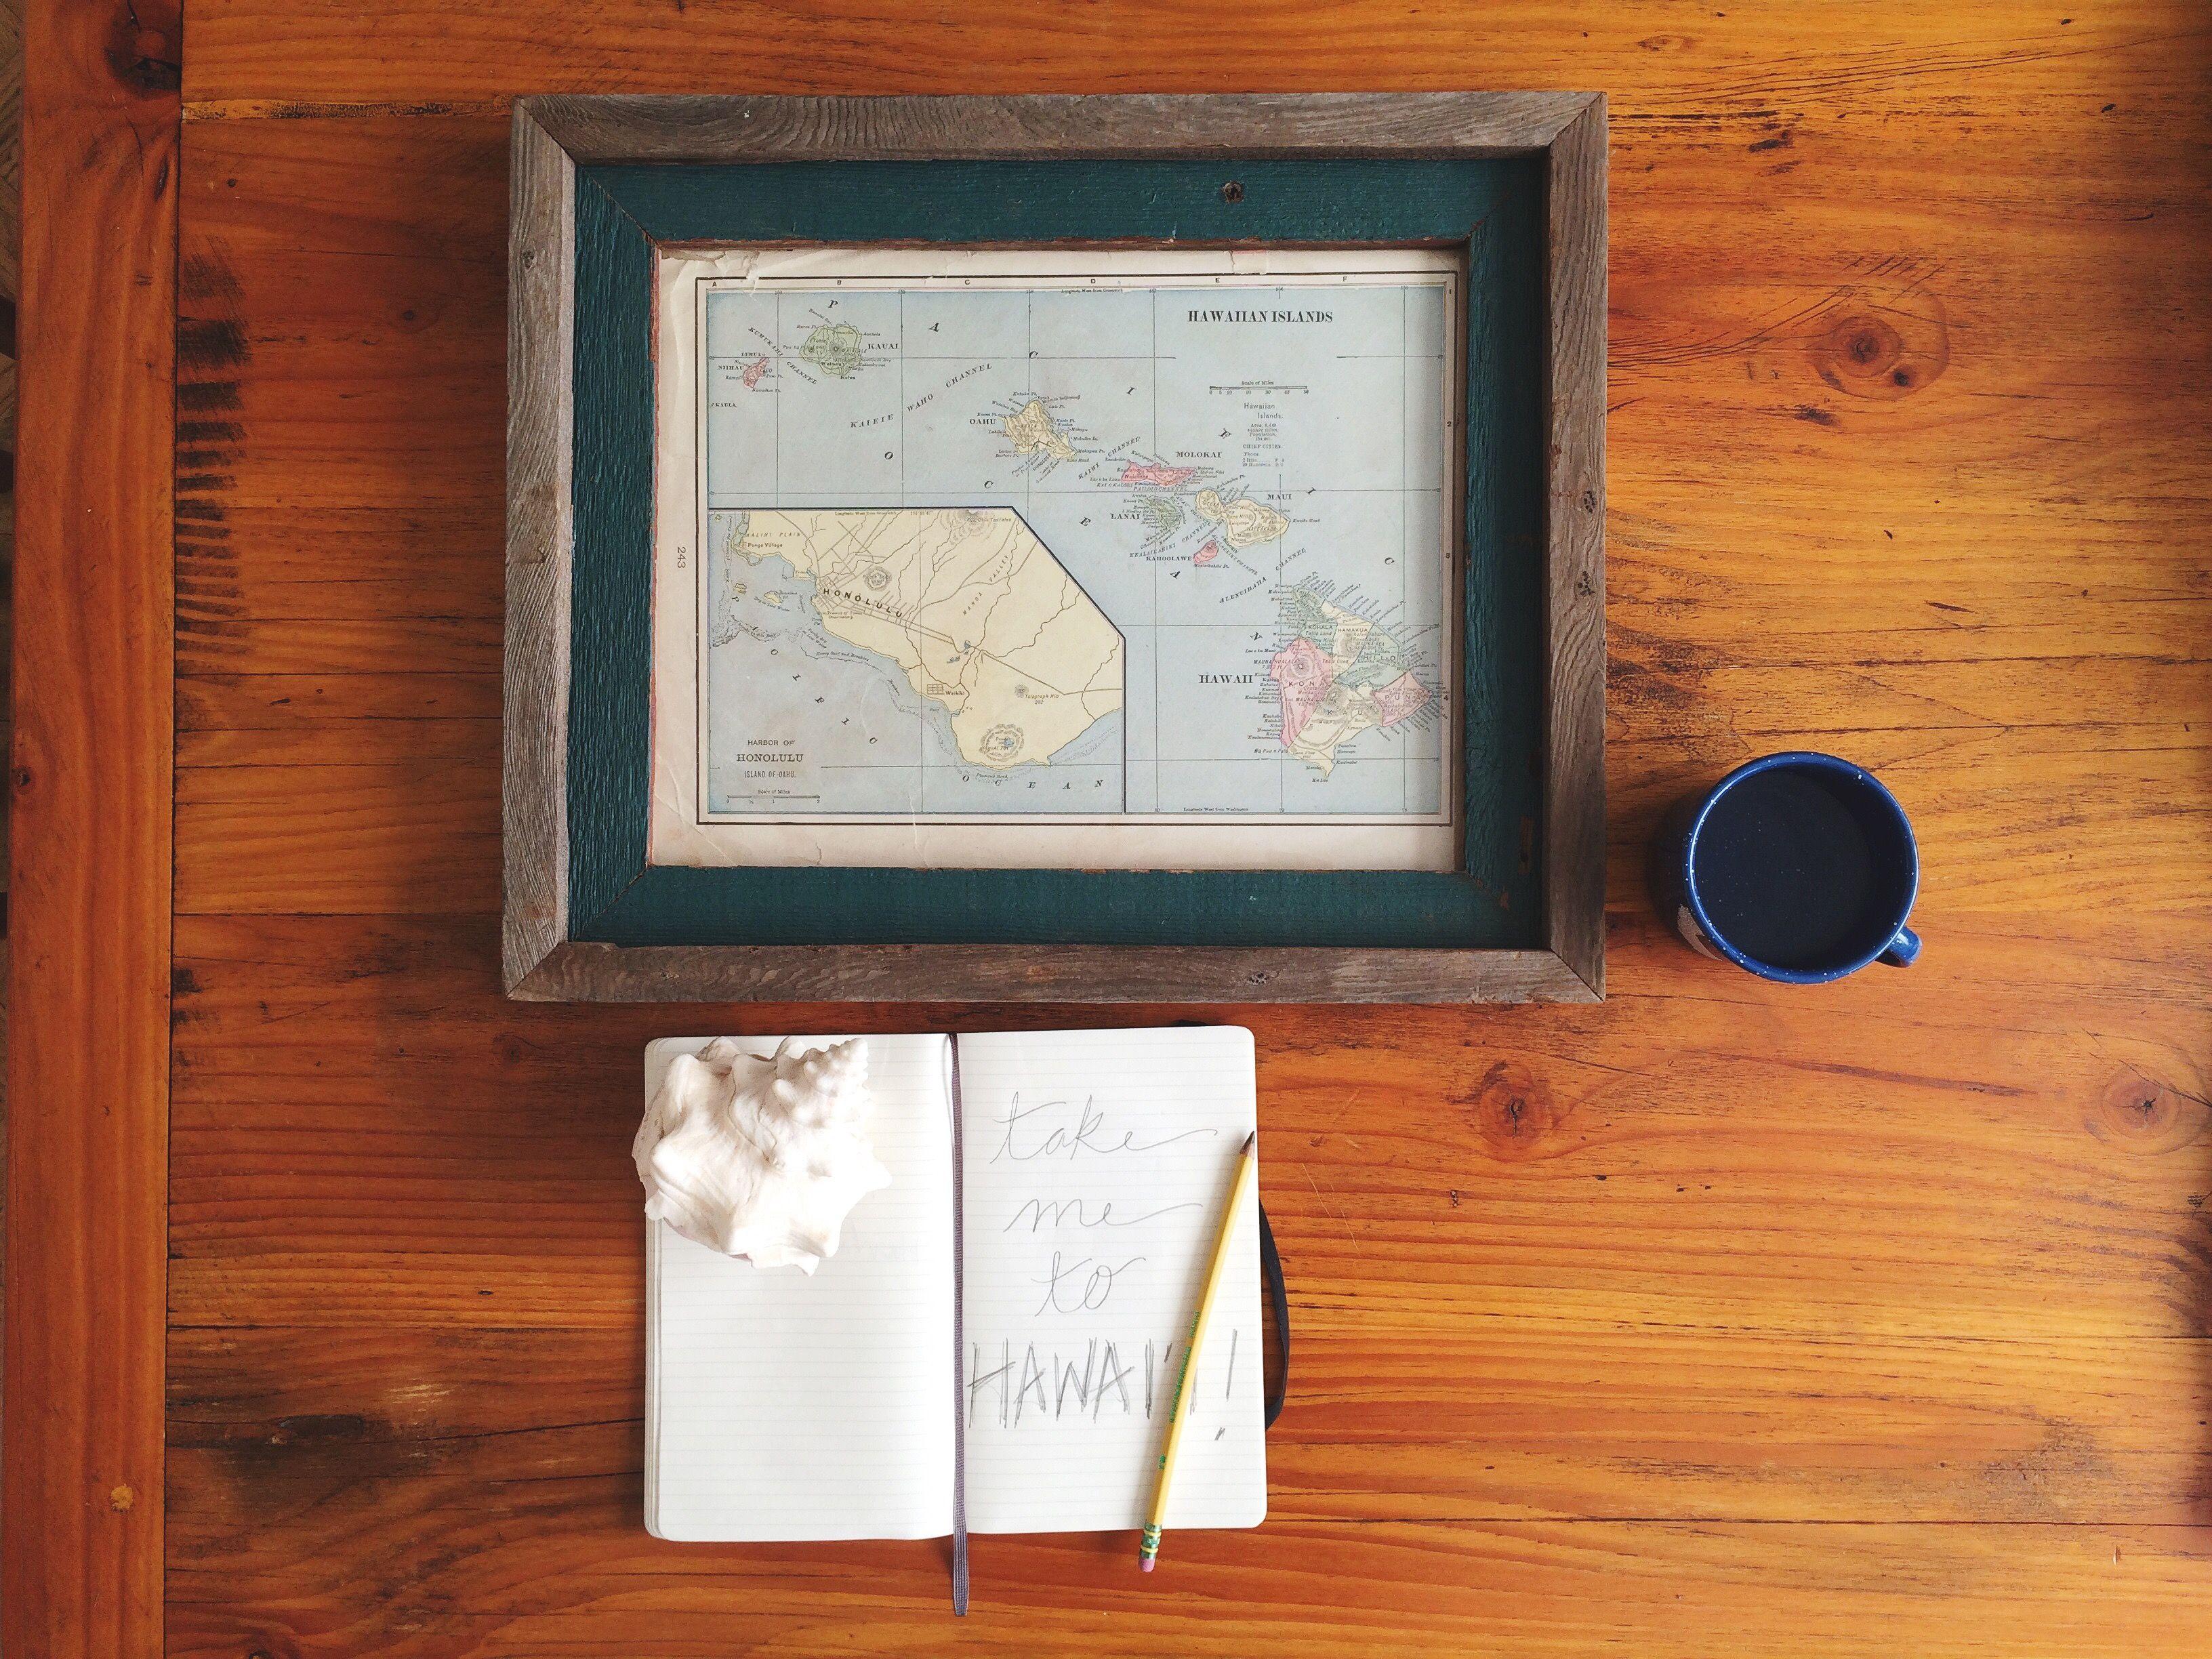 Take Me To Hawai I Reclaimed Wood Frame Made By Alibi Interiors